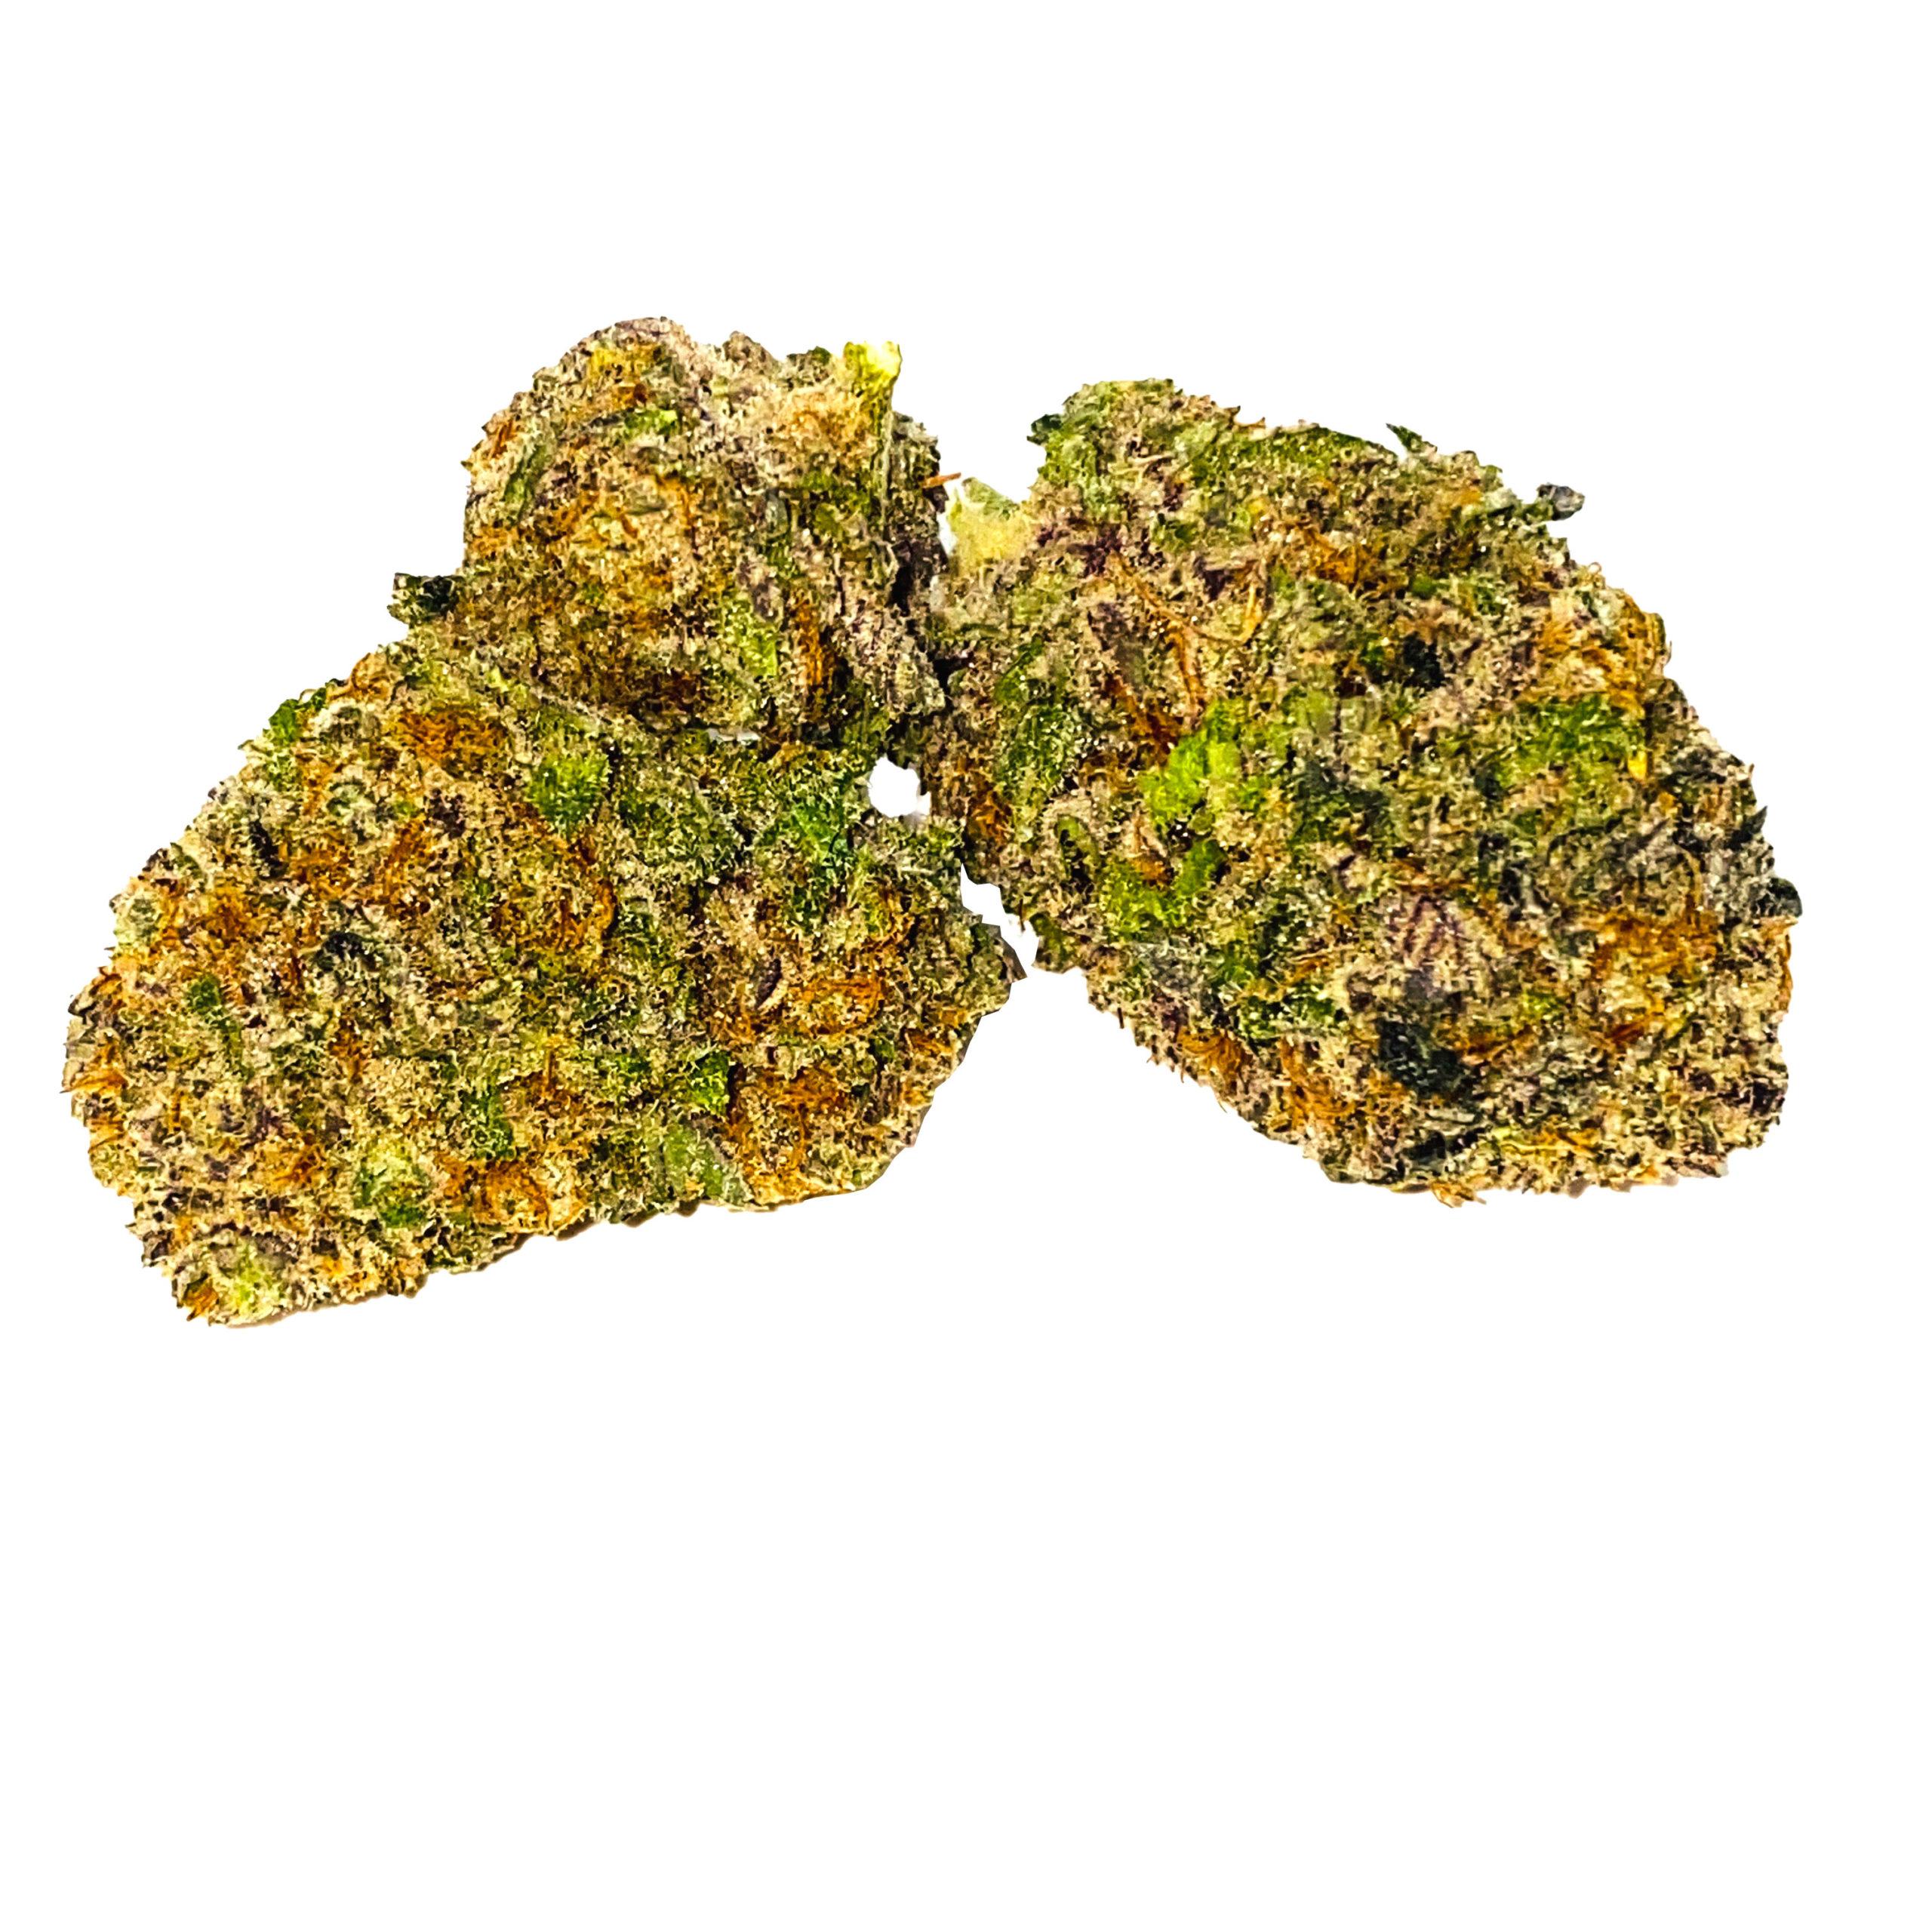 Nupepshrooms,Death,Star,Og,Cannabis